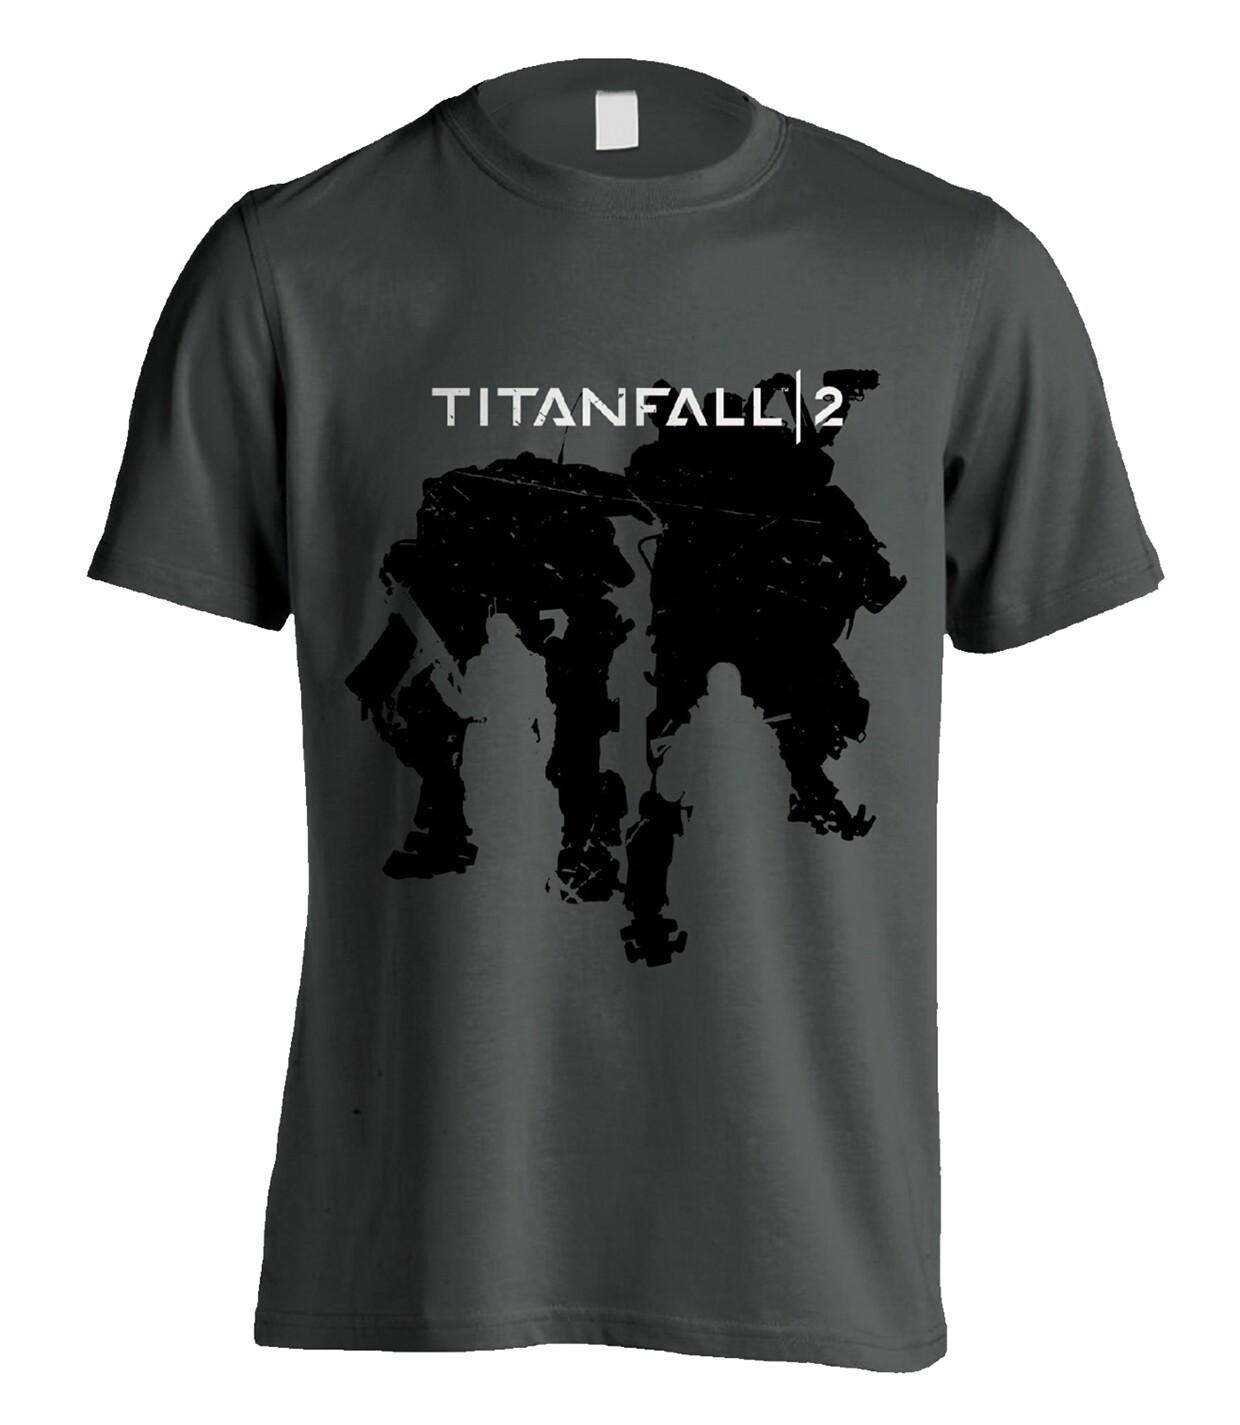 Titanfall 2 Titan Characters T Shirt